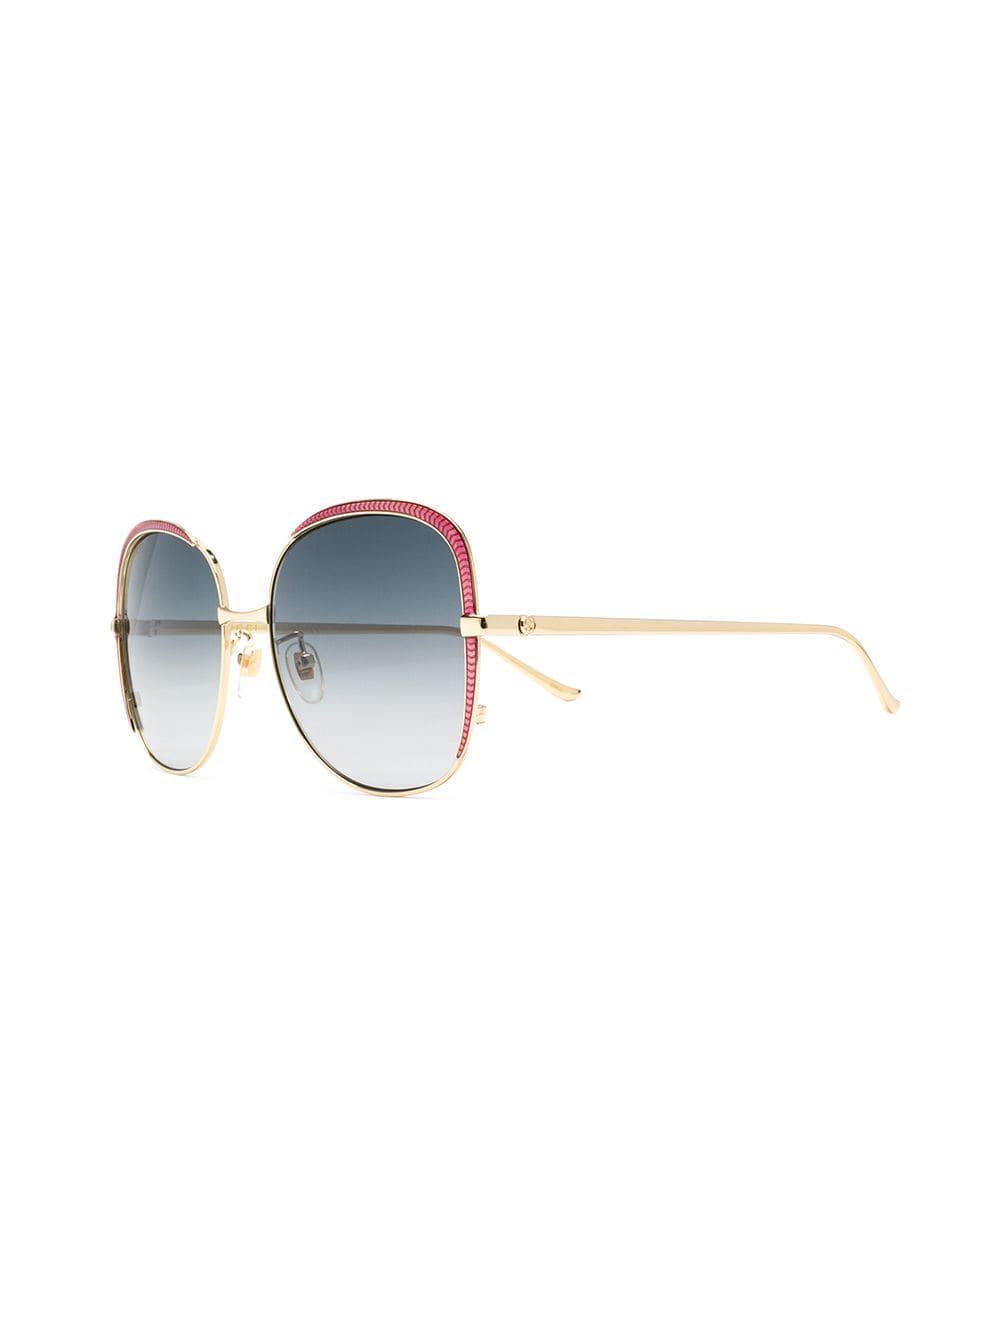 9fa89427d99 Gucci - Metallic Oversized Frames Sunglasses - Lyst. View fullscreen